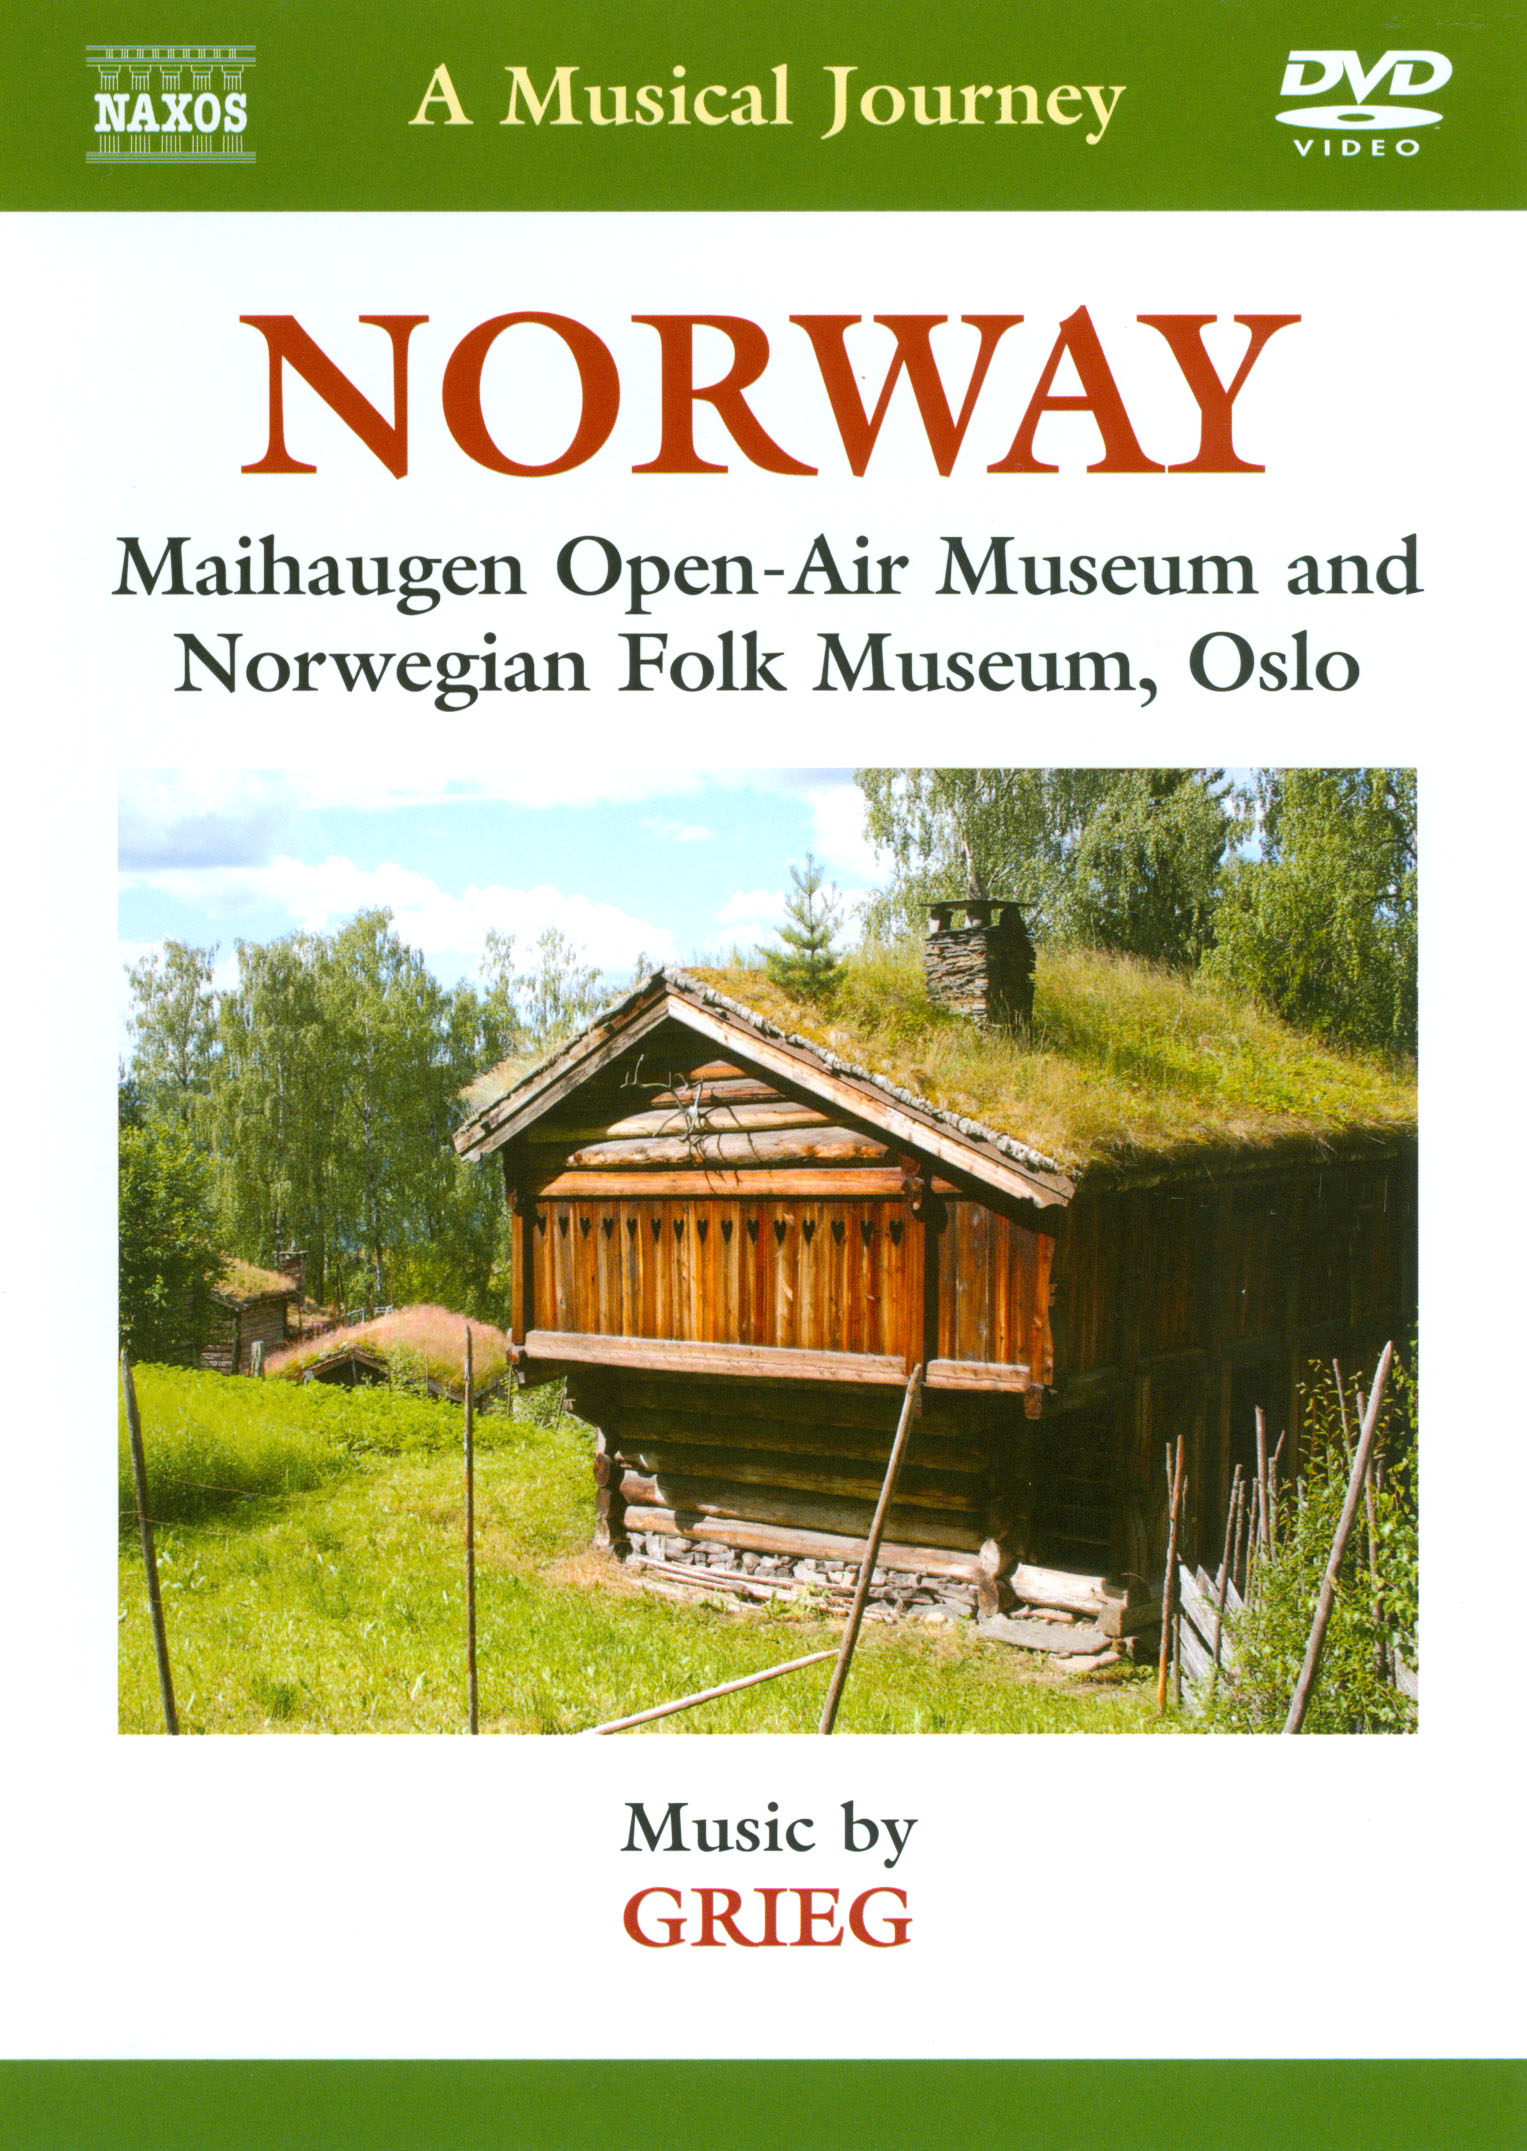 A Musical Journey: Norway - Maihaugen Open-Air Museum and Norwegian Folk Museum, Oslo